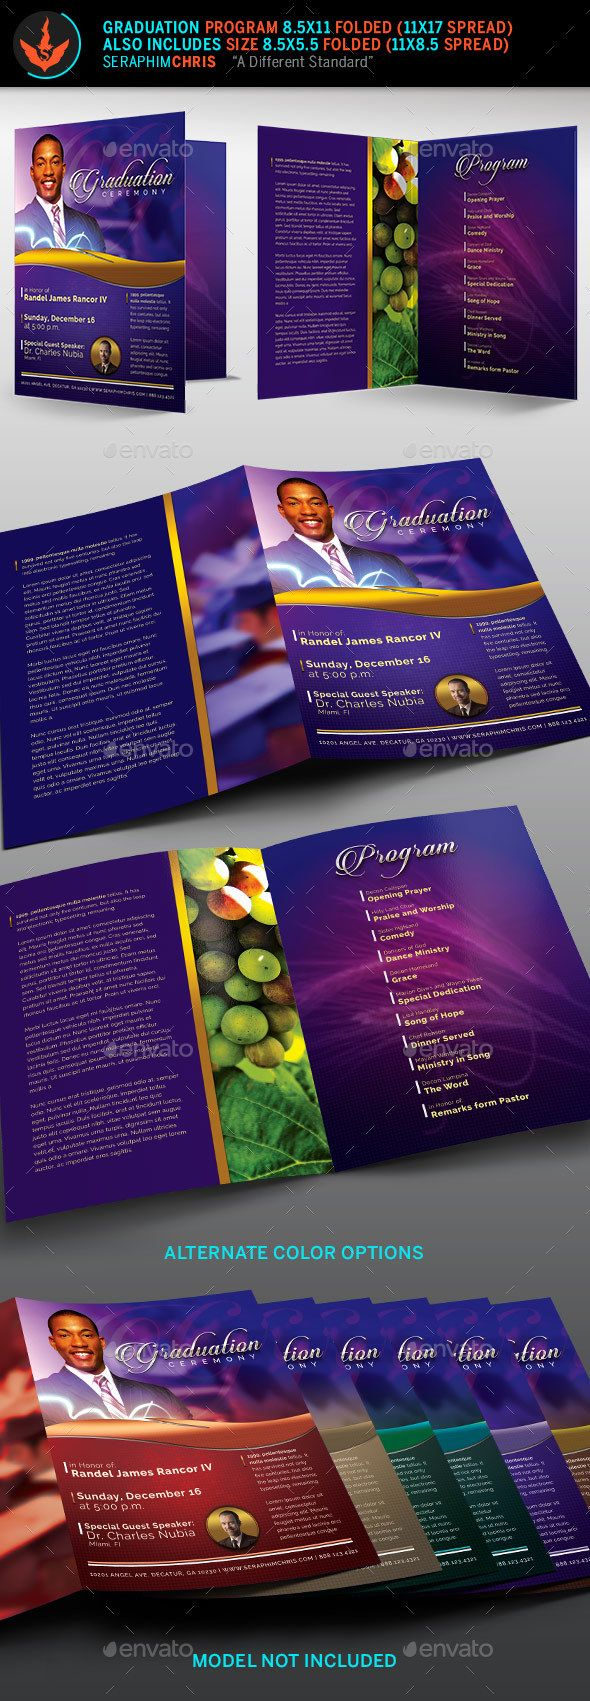 pastor s graduation ceremony program template by seraphimchris